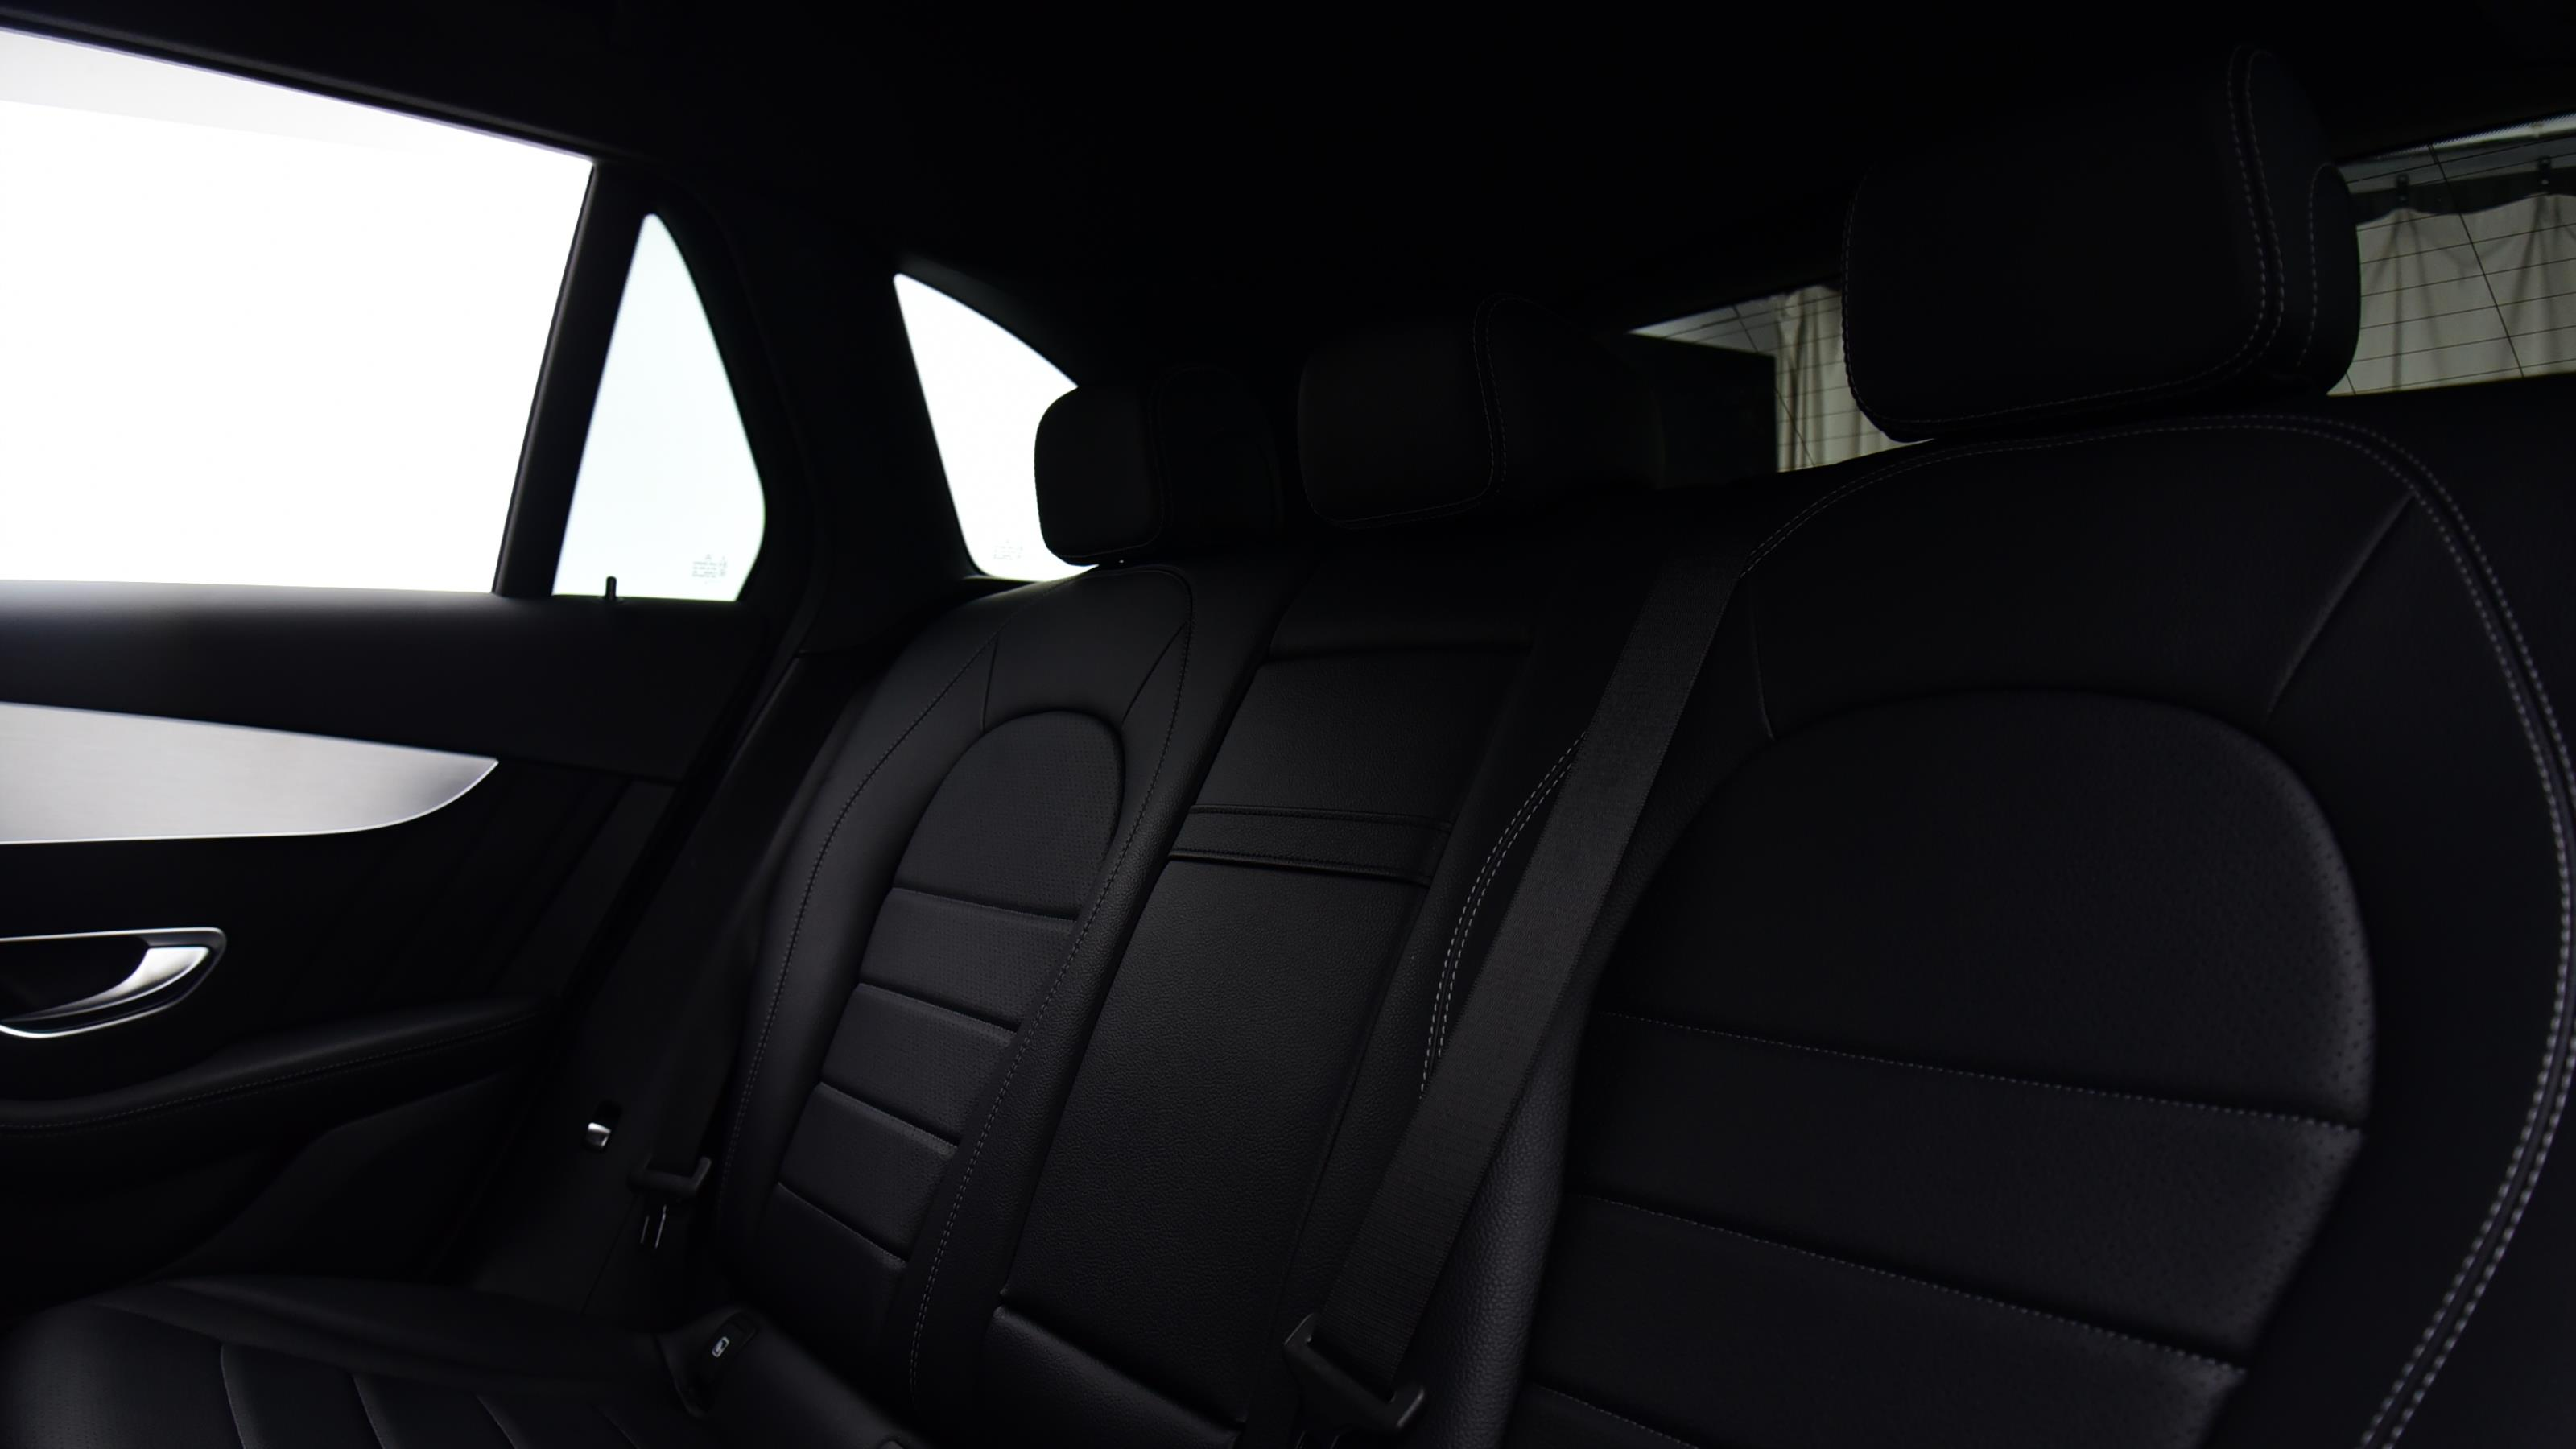 Used 2016 Mercedes-Benz GLC GLC 220d 4Matic AMG Line 5dr 9G-Tronic BLACK at Saxton4x4